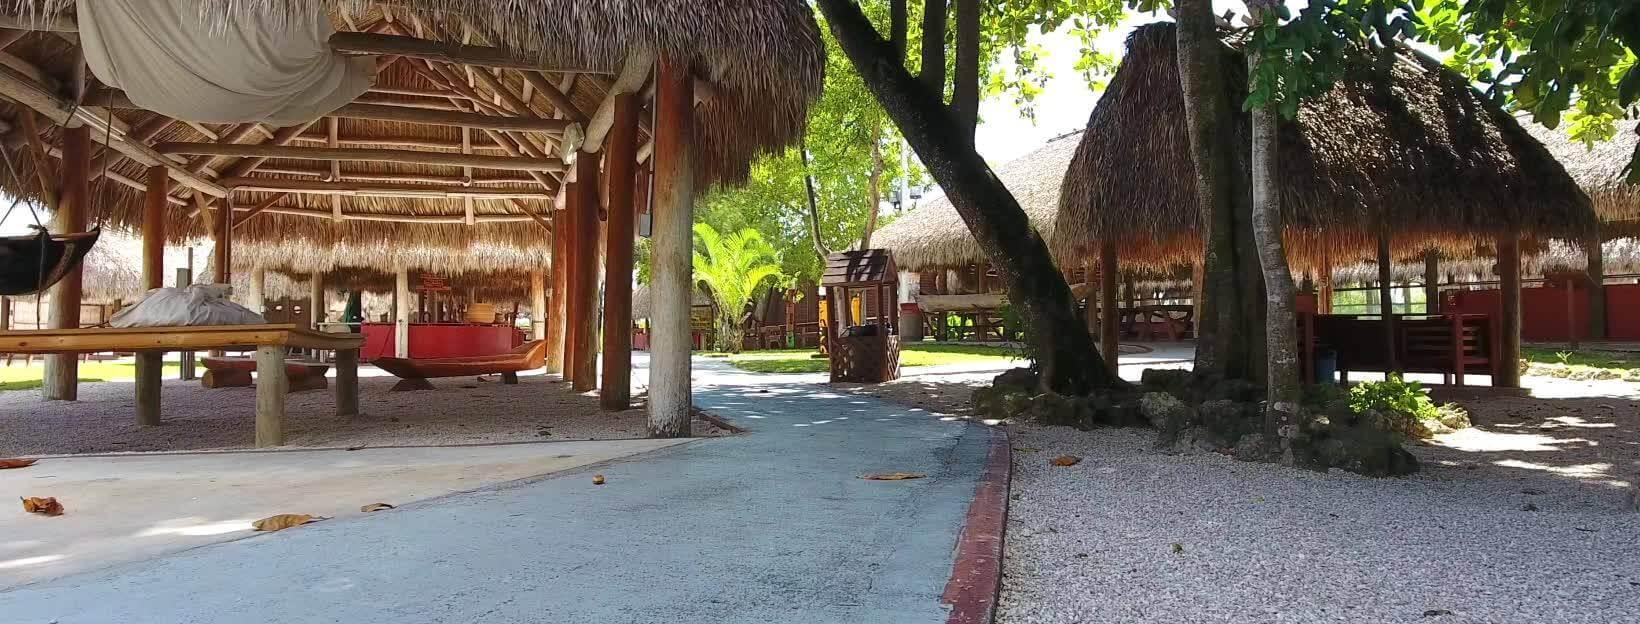 Photo of Miccosukee Indian Village in Miami Florida